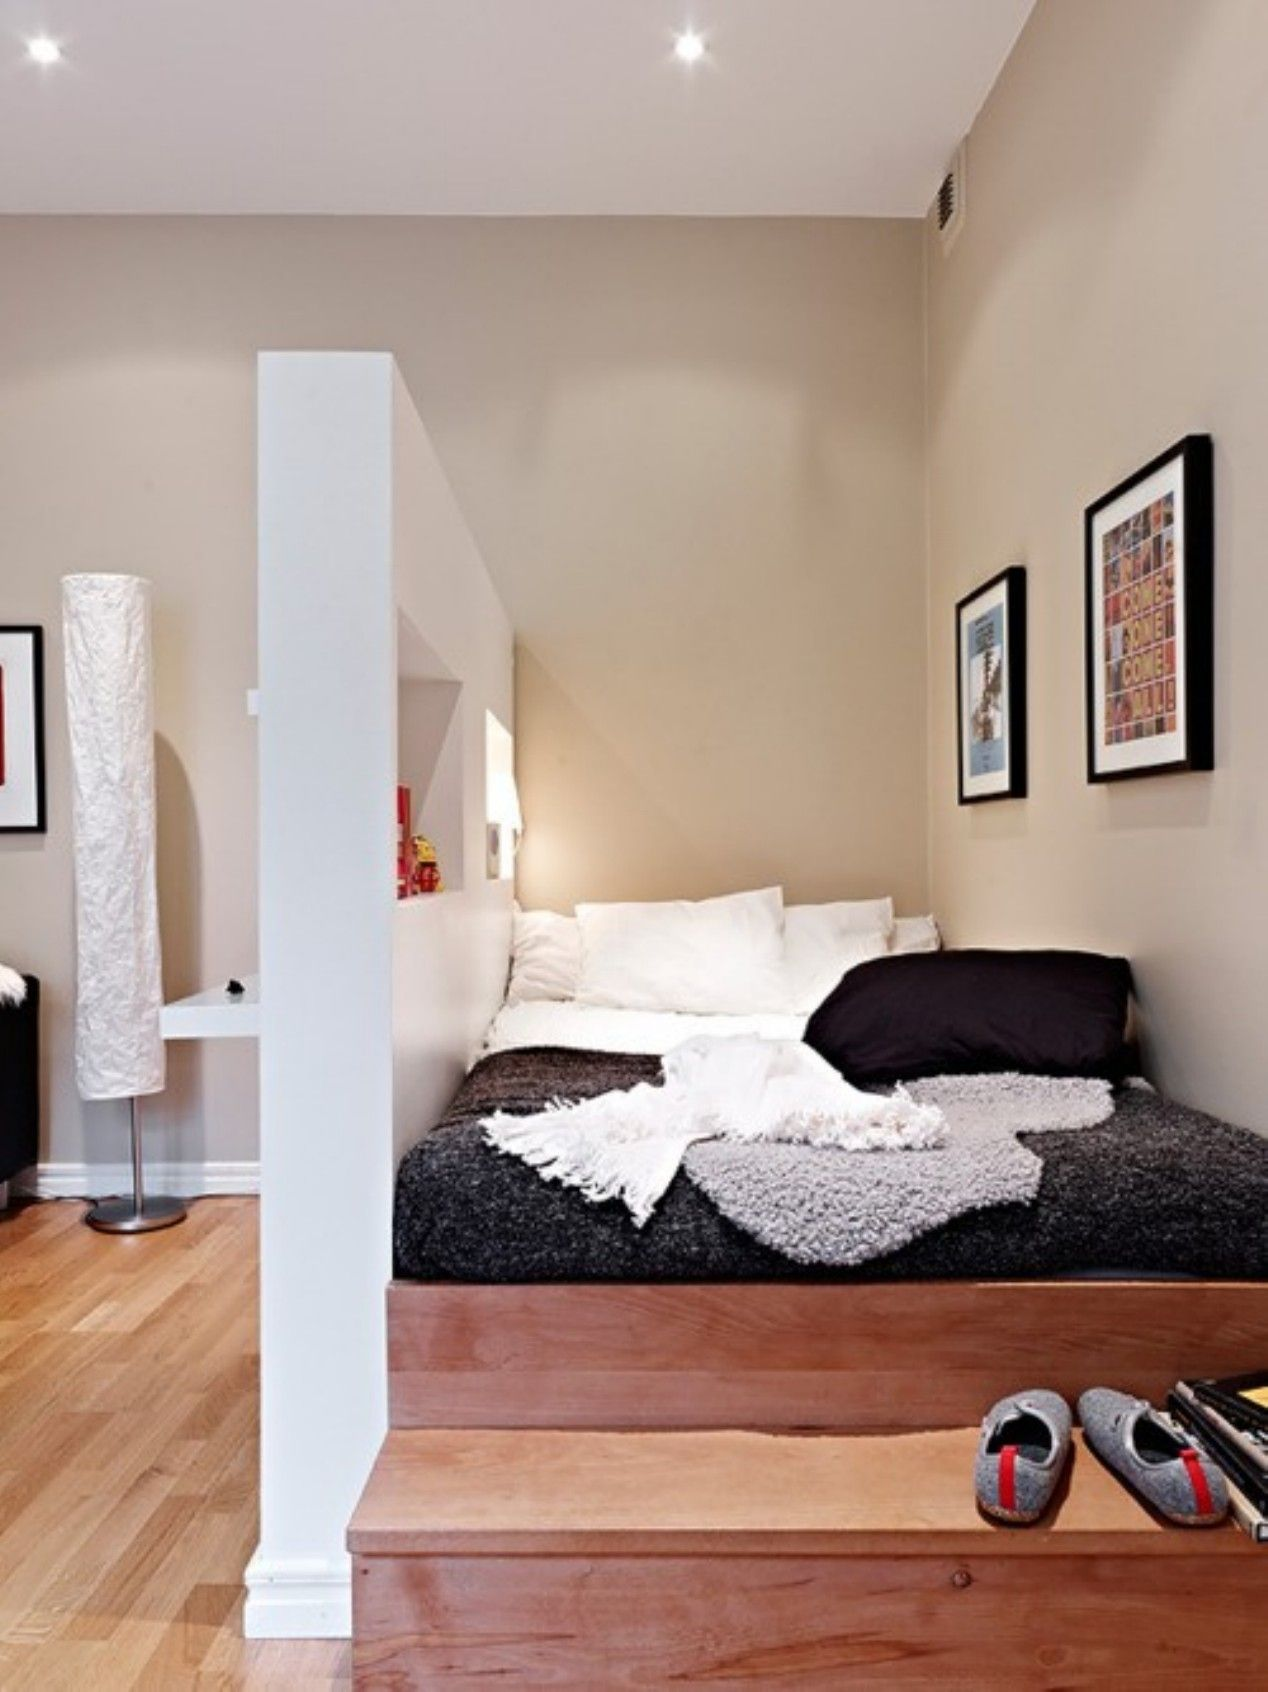 46 Amazing Efficiency Apartment Decorating Ideas | Apartments ...